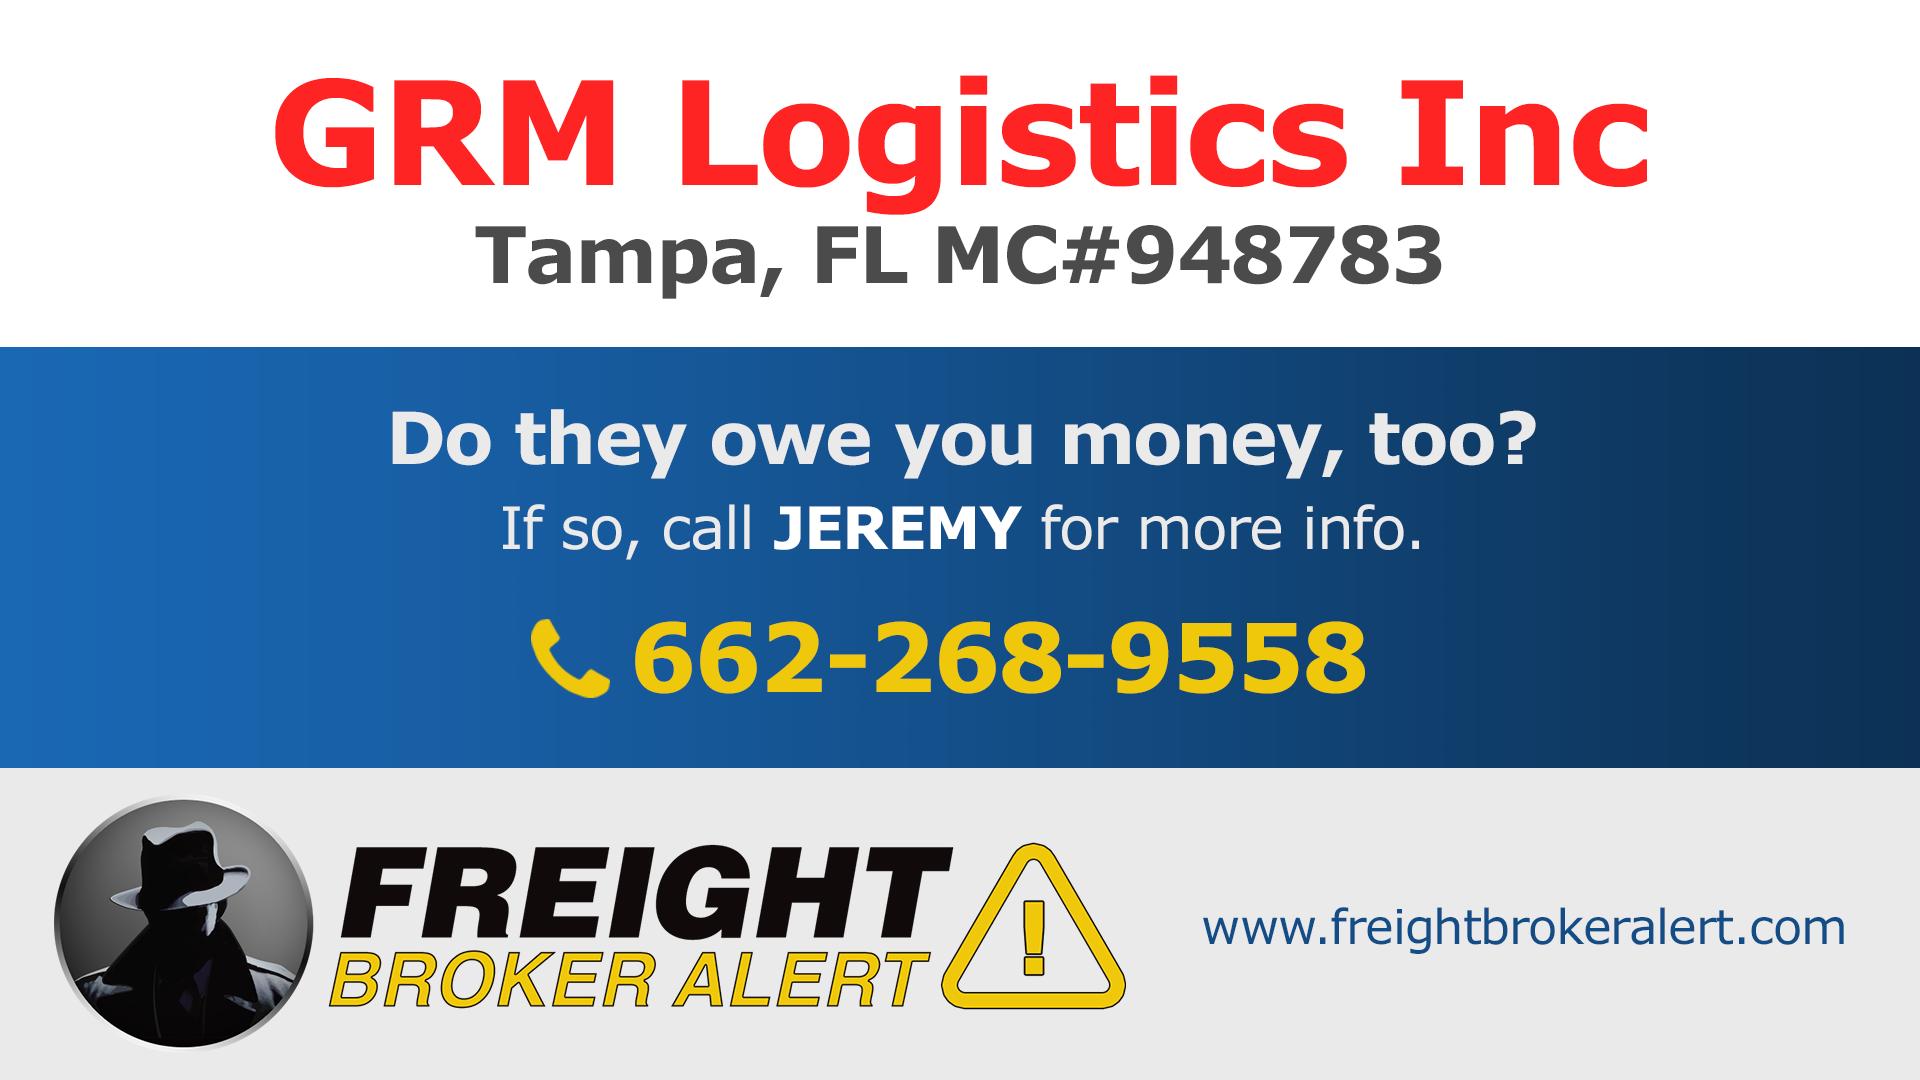 GRM Logistics Inc Florida